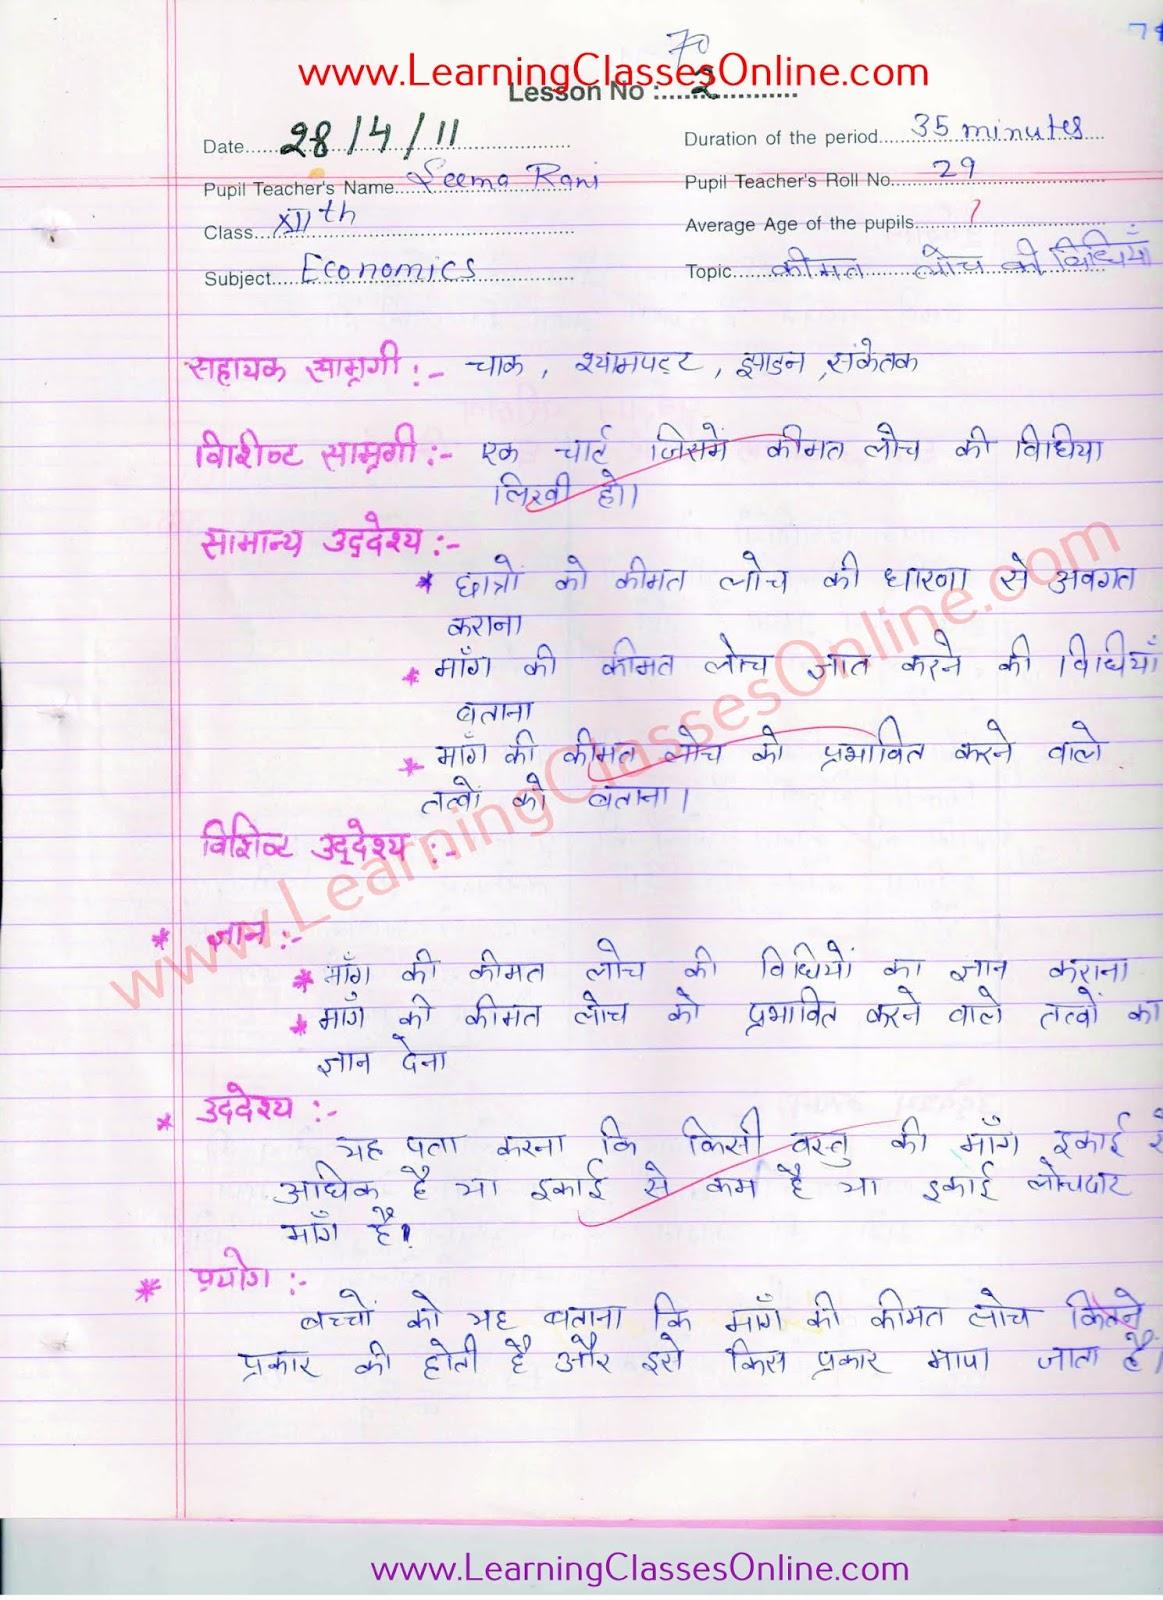 Lesson Plan for Economics Class 12 in Hindi on कीमत लोच ( Price Elasticity) free download pdf